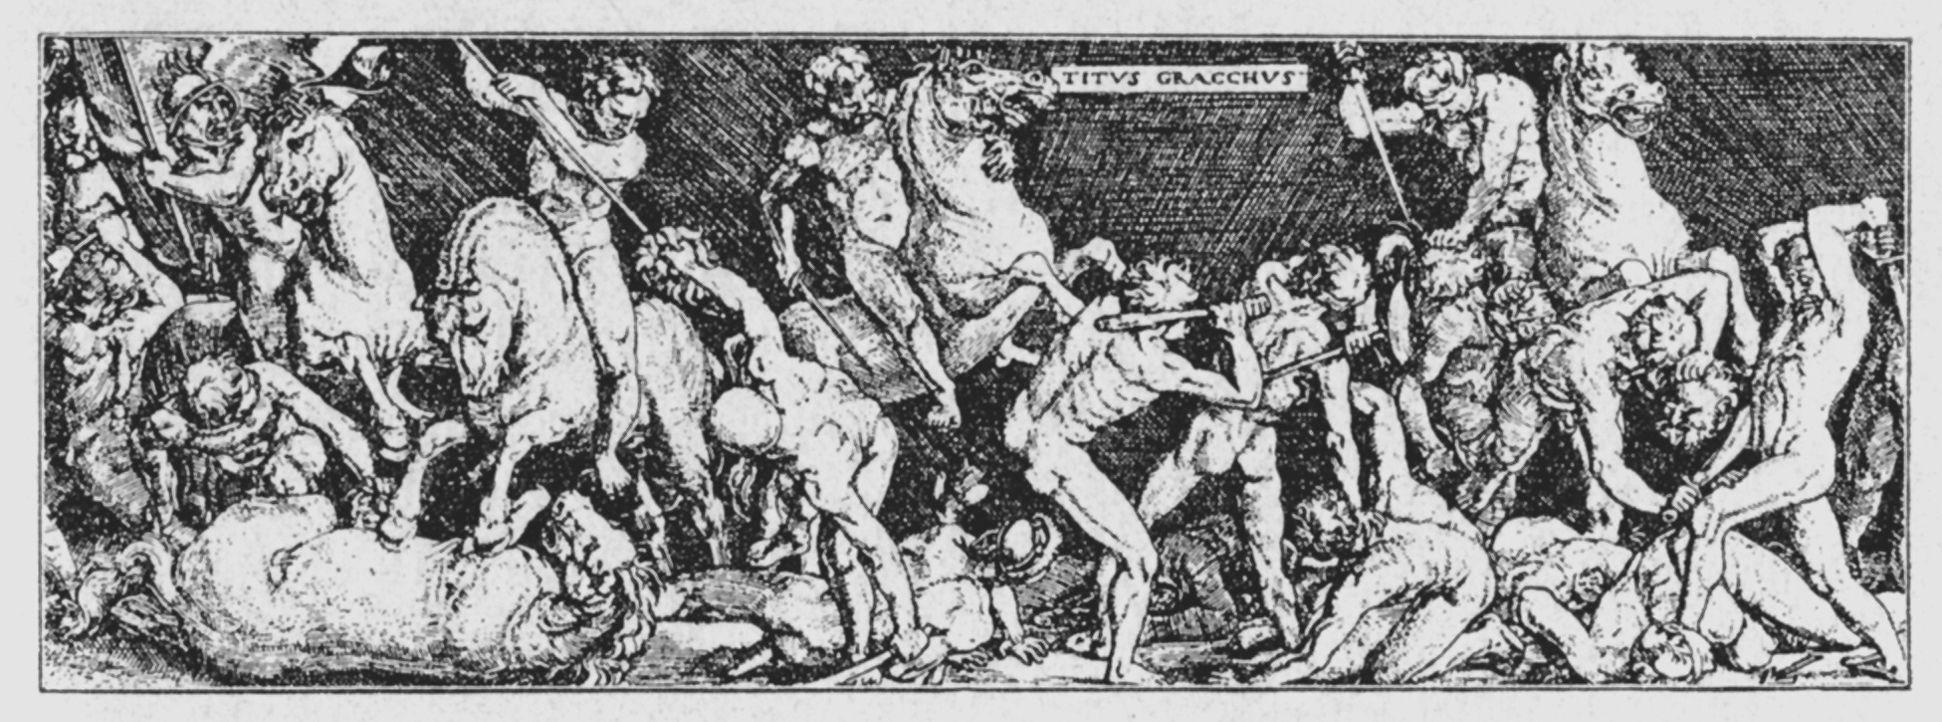 Cavalry battle (Titus Gracchus, Detail)